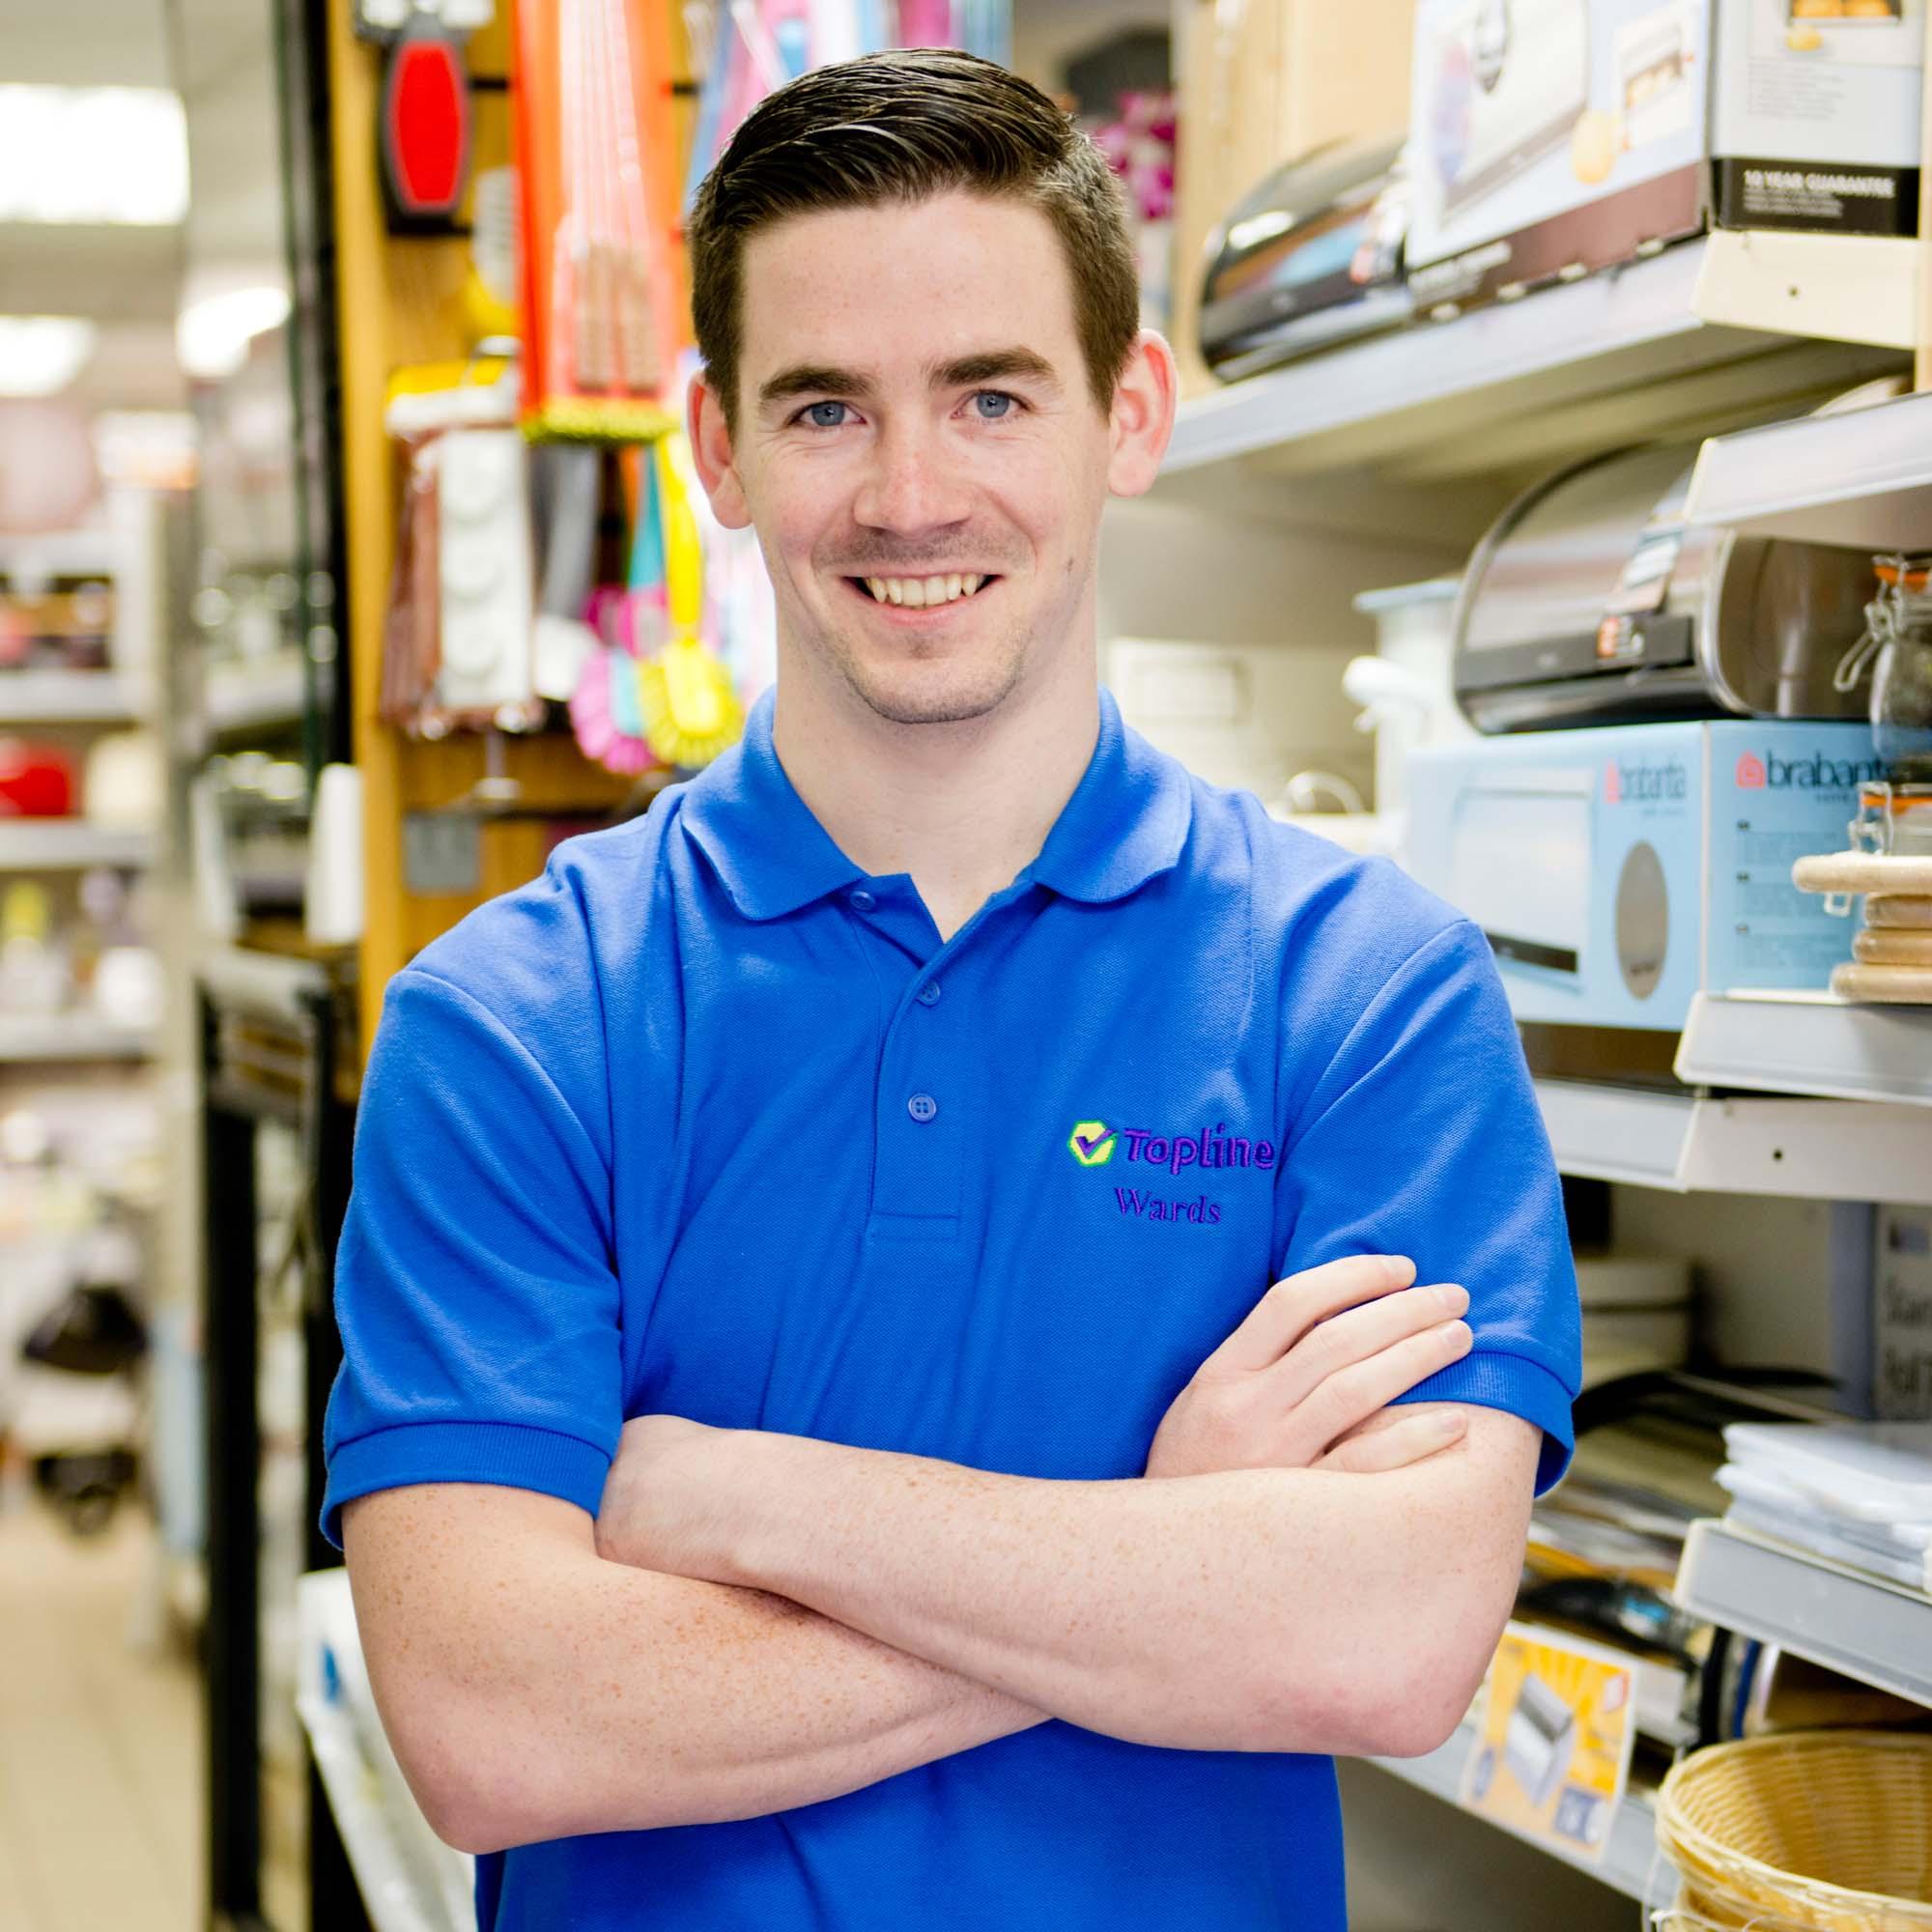 learn more about our enterprise topline wards s assistant david nestor